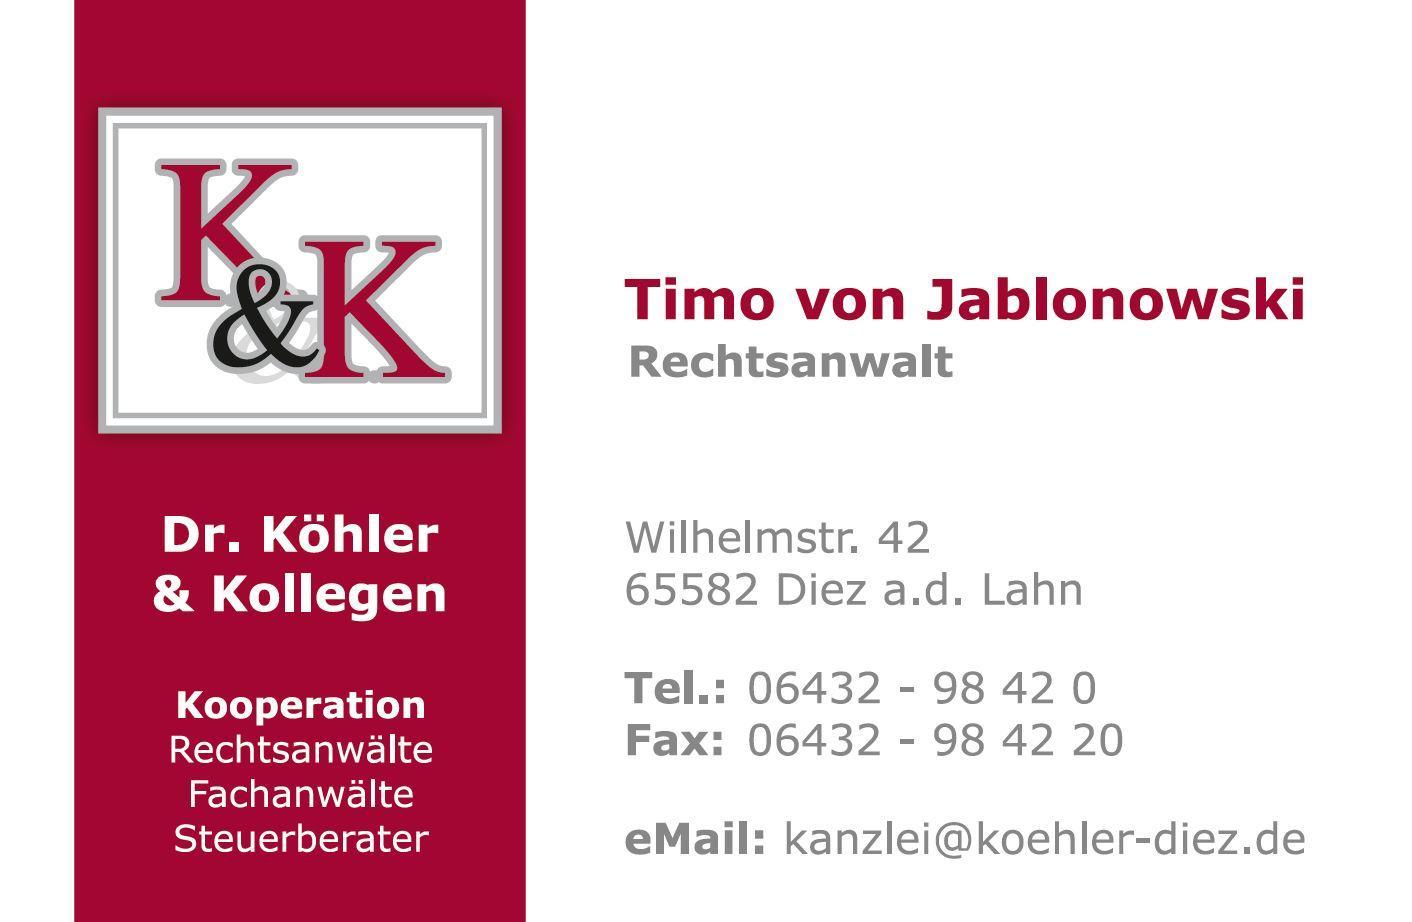 Dr. Köhler & Kollegen, Rechtsanwälte